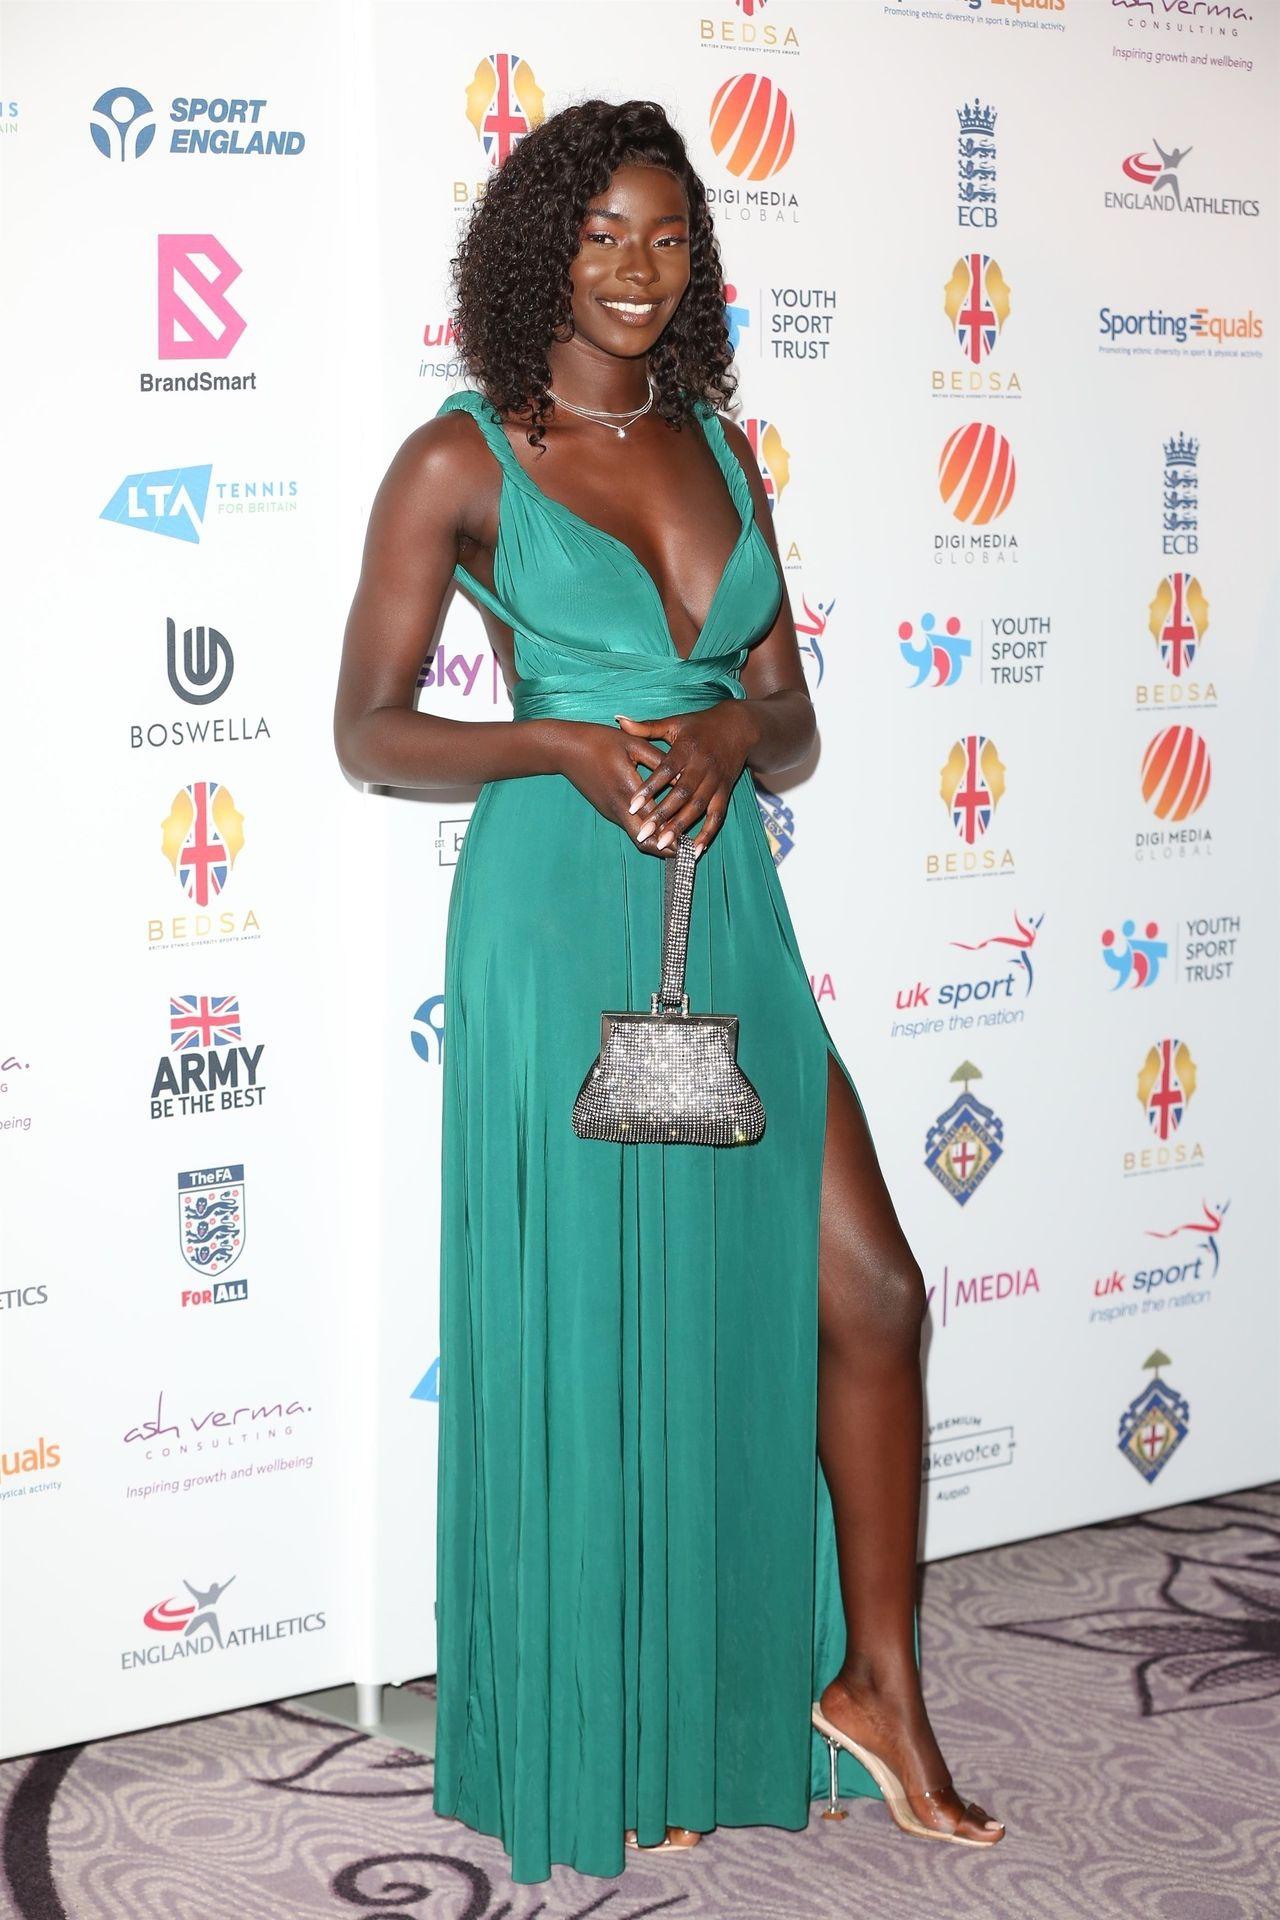 Mike Boateng & Priscilla Anyabu Are Seen At British Ethnic Diversity Sports Awards 0030